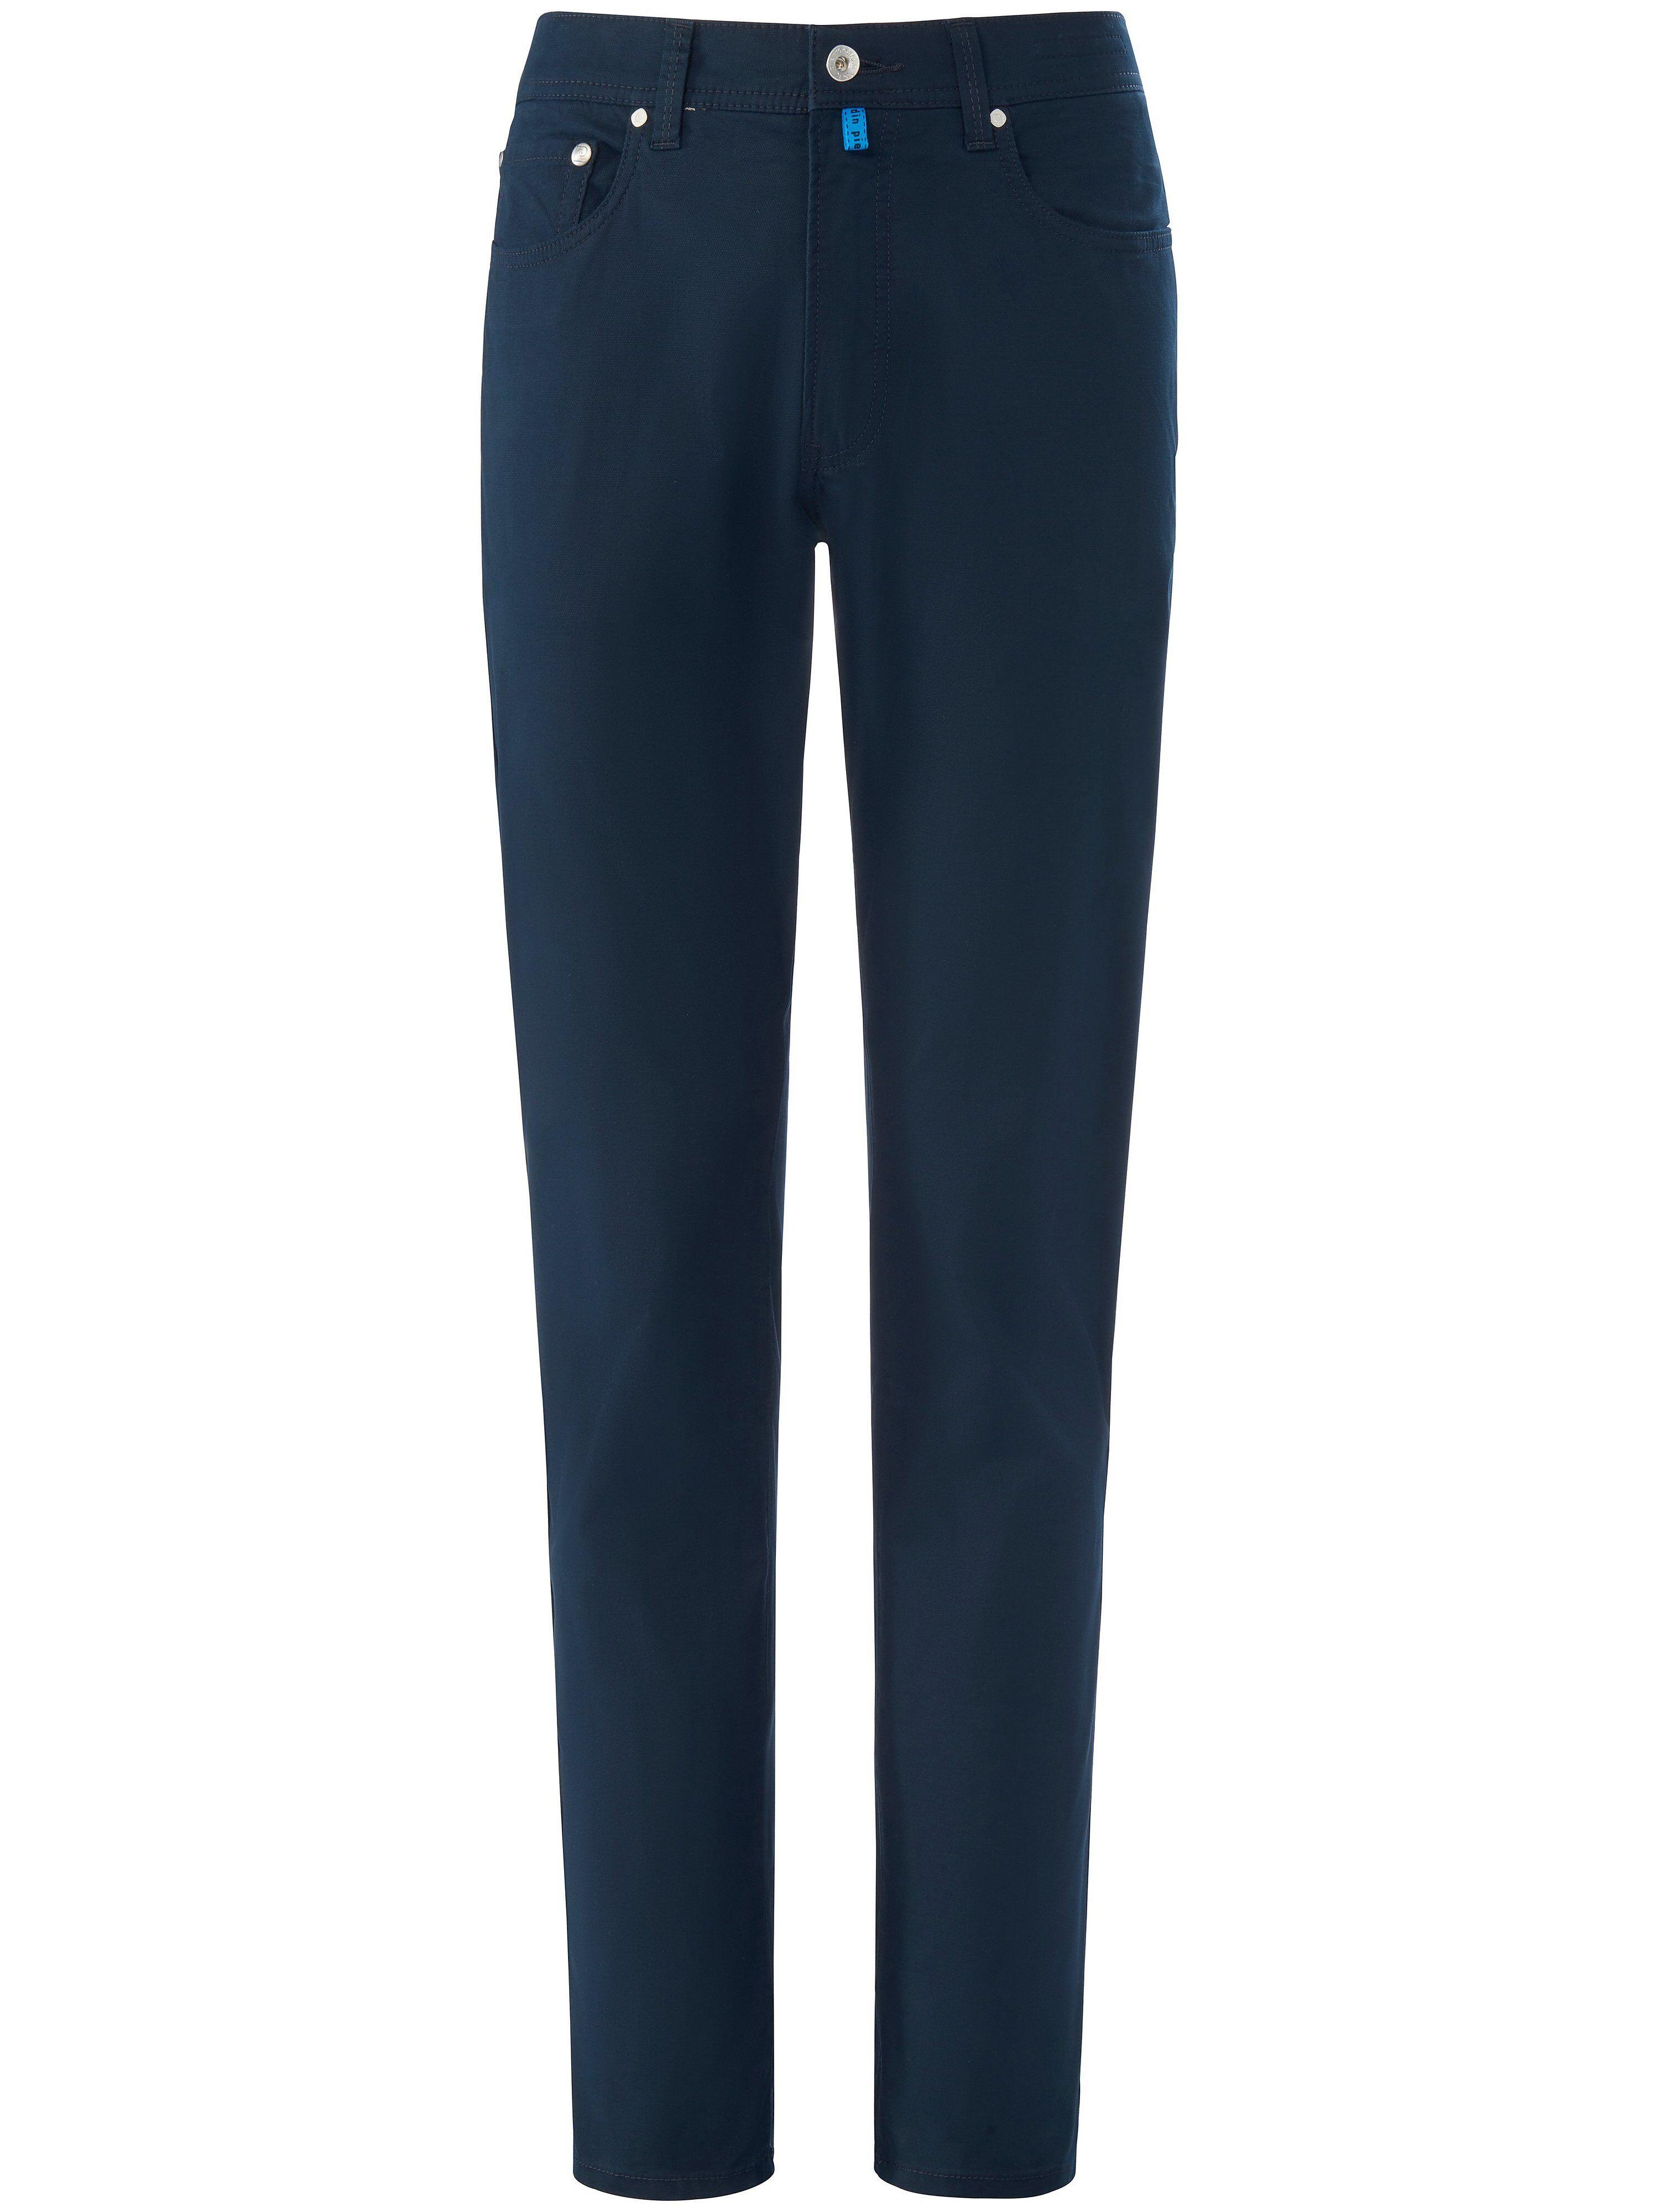 Pierre Cardin Le pantalon Regular Fit modèle Lyon Tapered  Pierre Cardin bleu  - Homme - 26